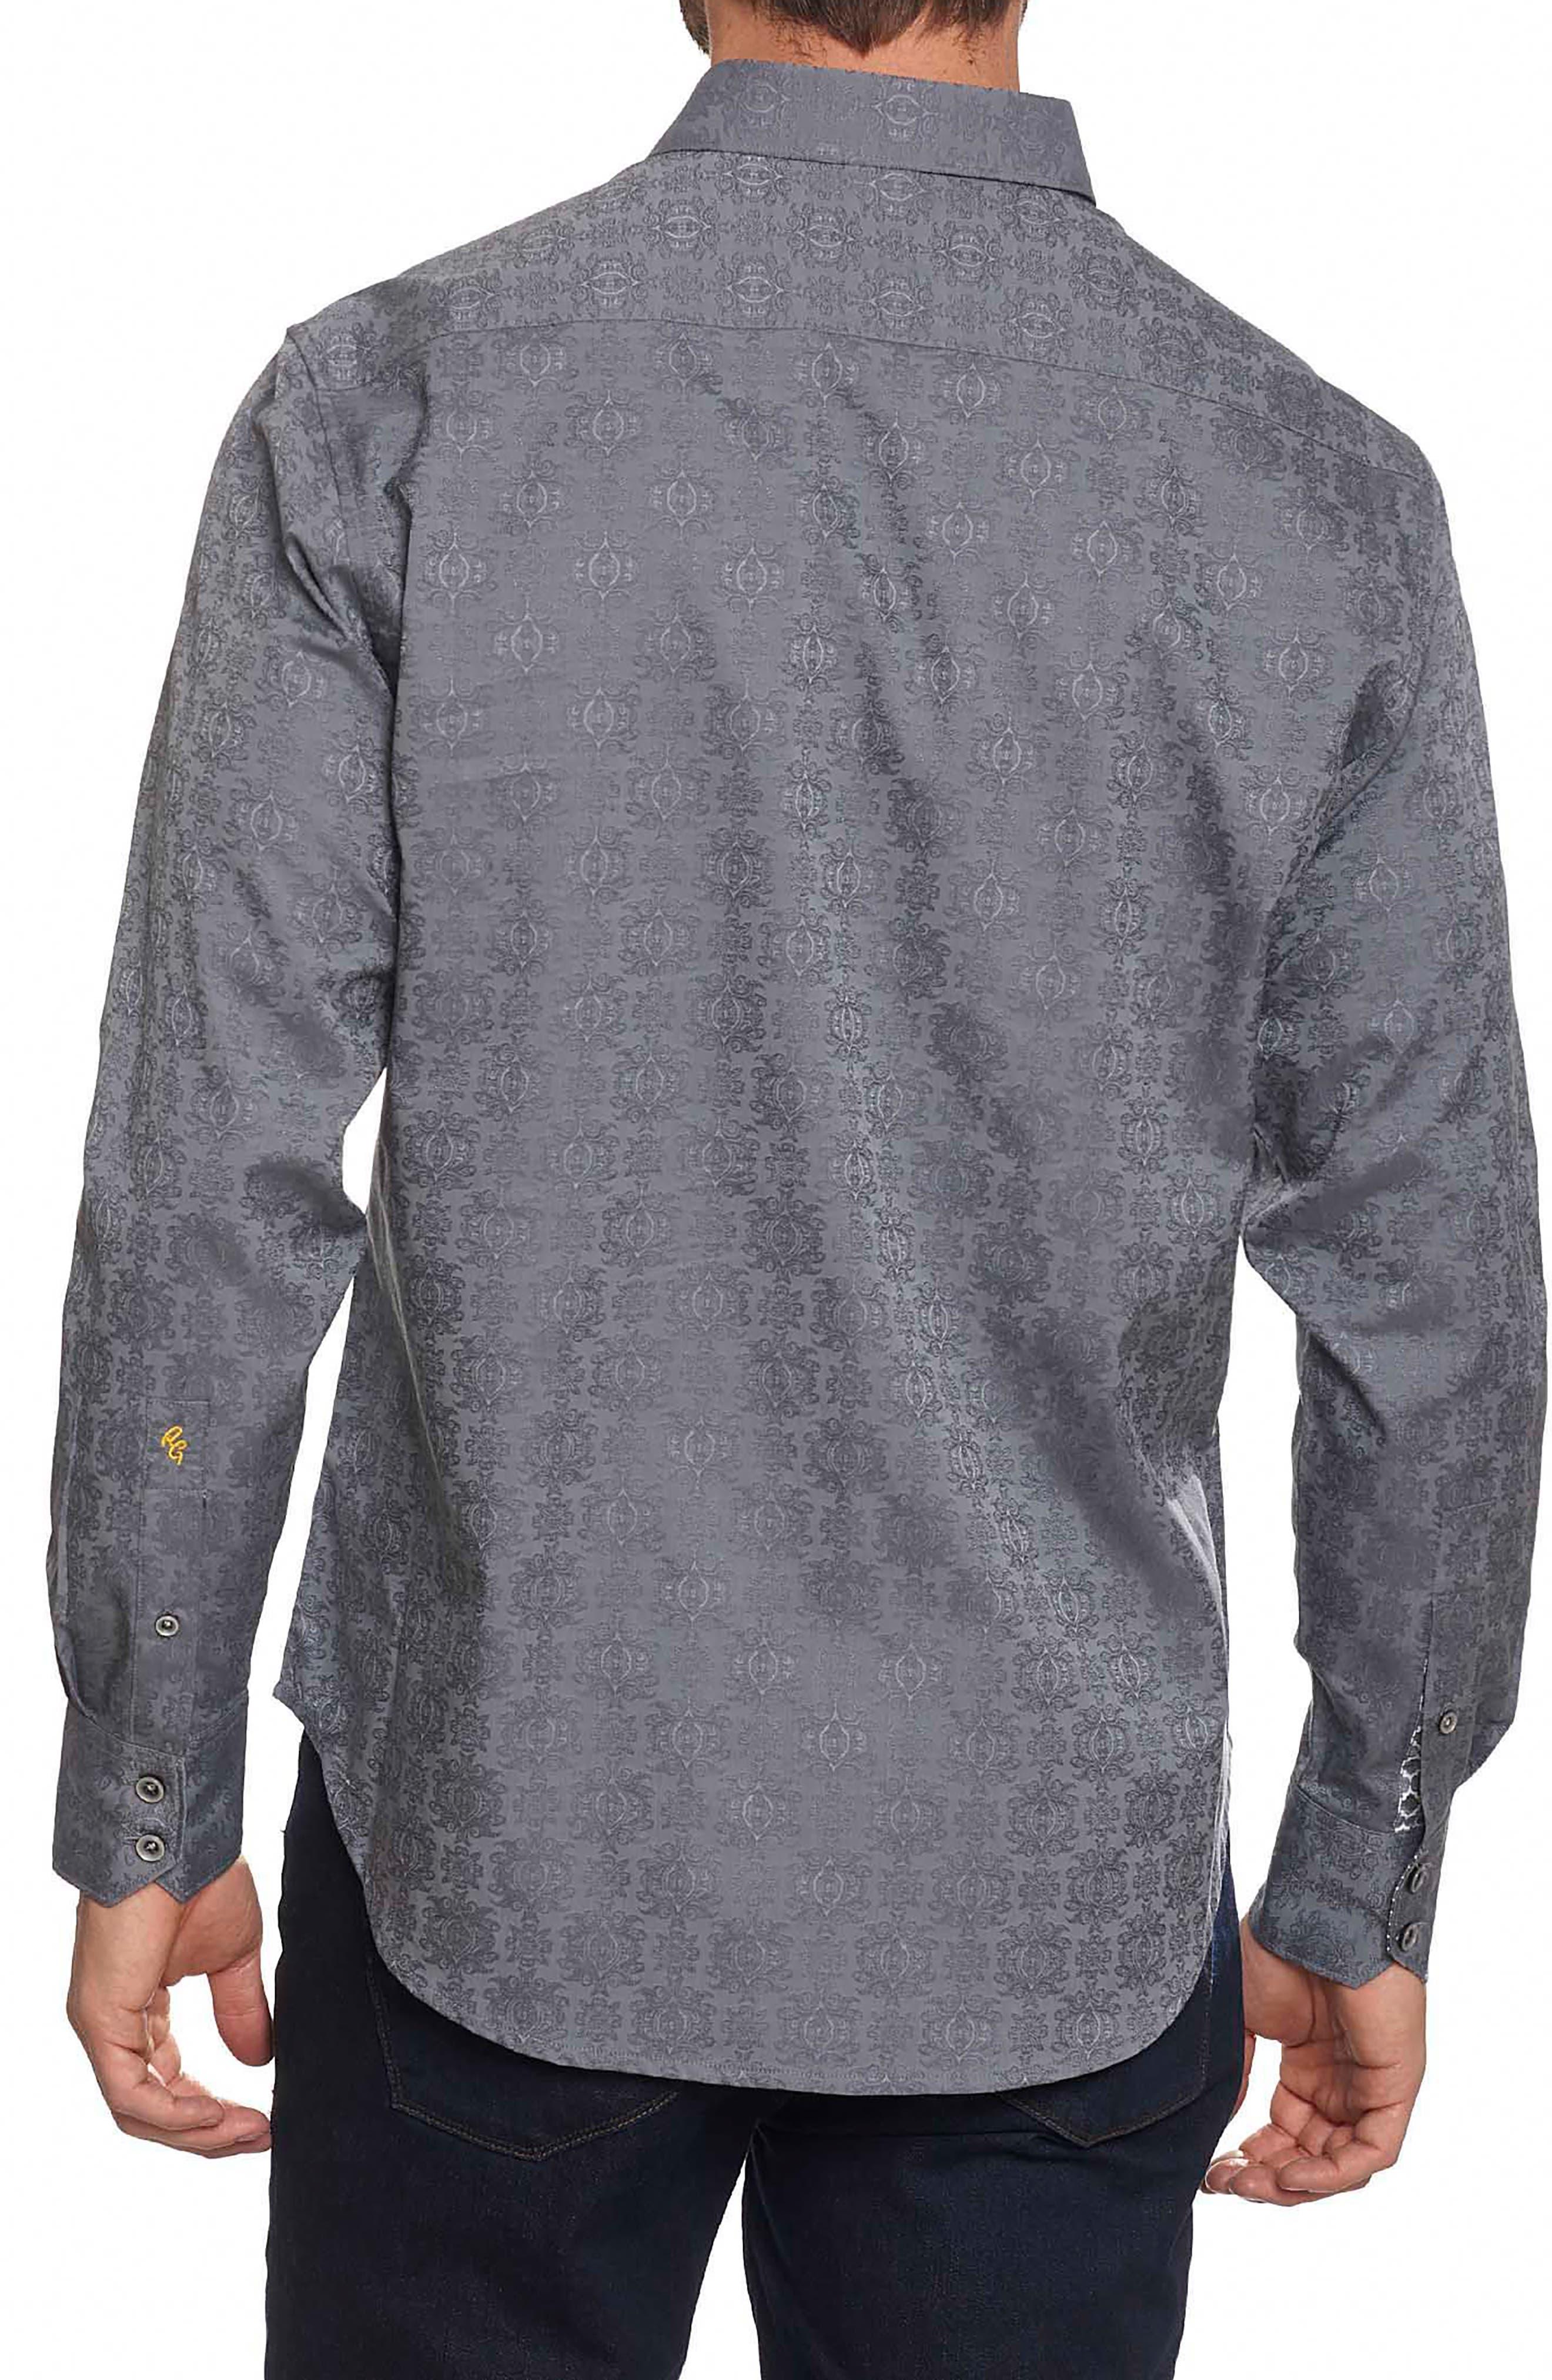 'Cullen' Classic Fit Jacquard Sport Shirt,                             Alternate thumbnail 2, color,                             020